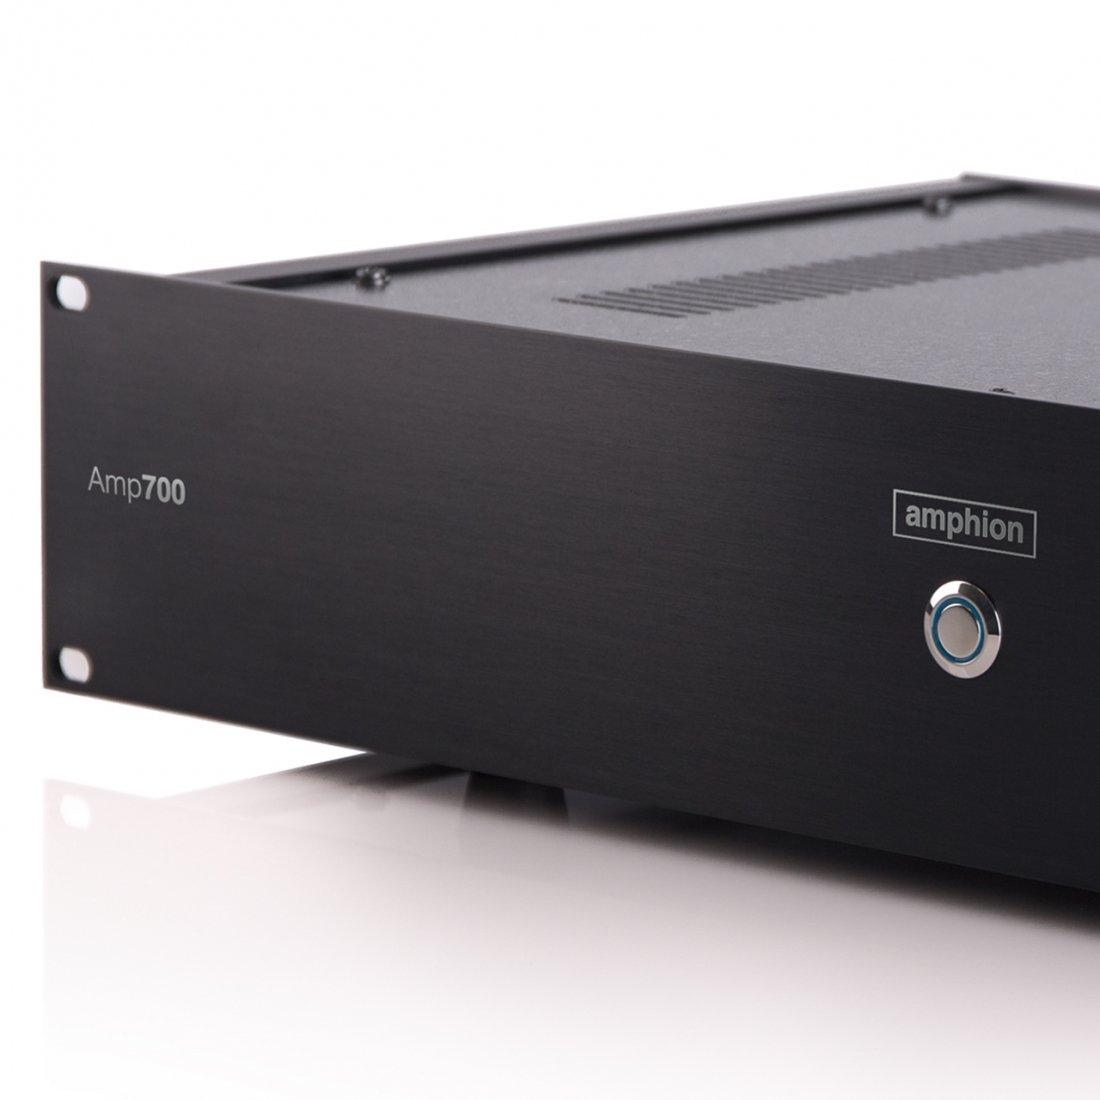 Amphion(アンフィオン) Amp700 Stereo amplifier 2 x 700W